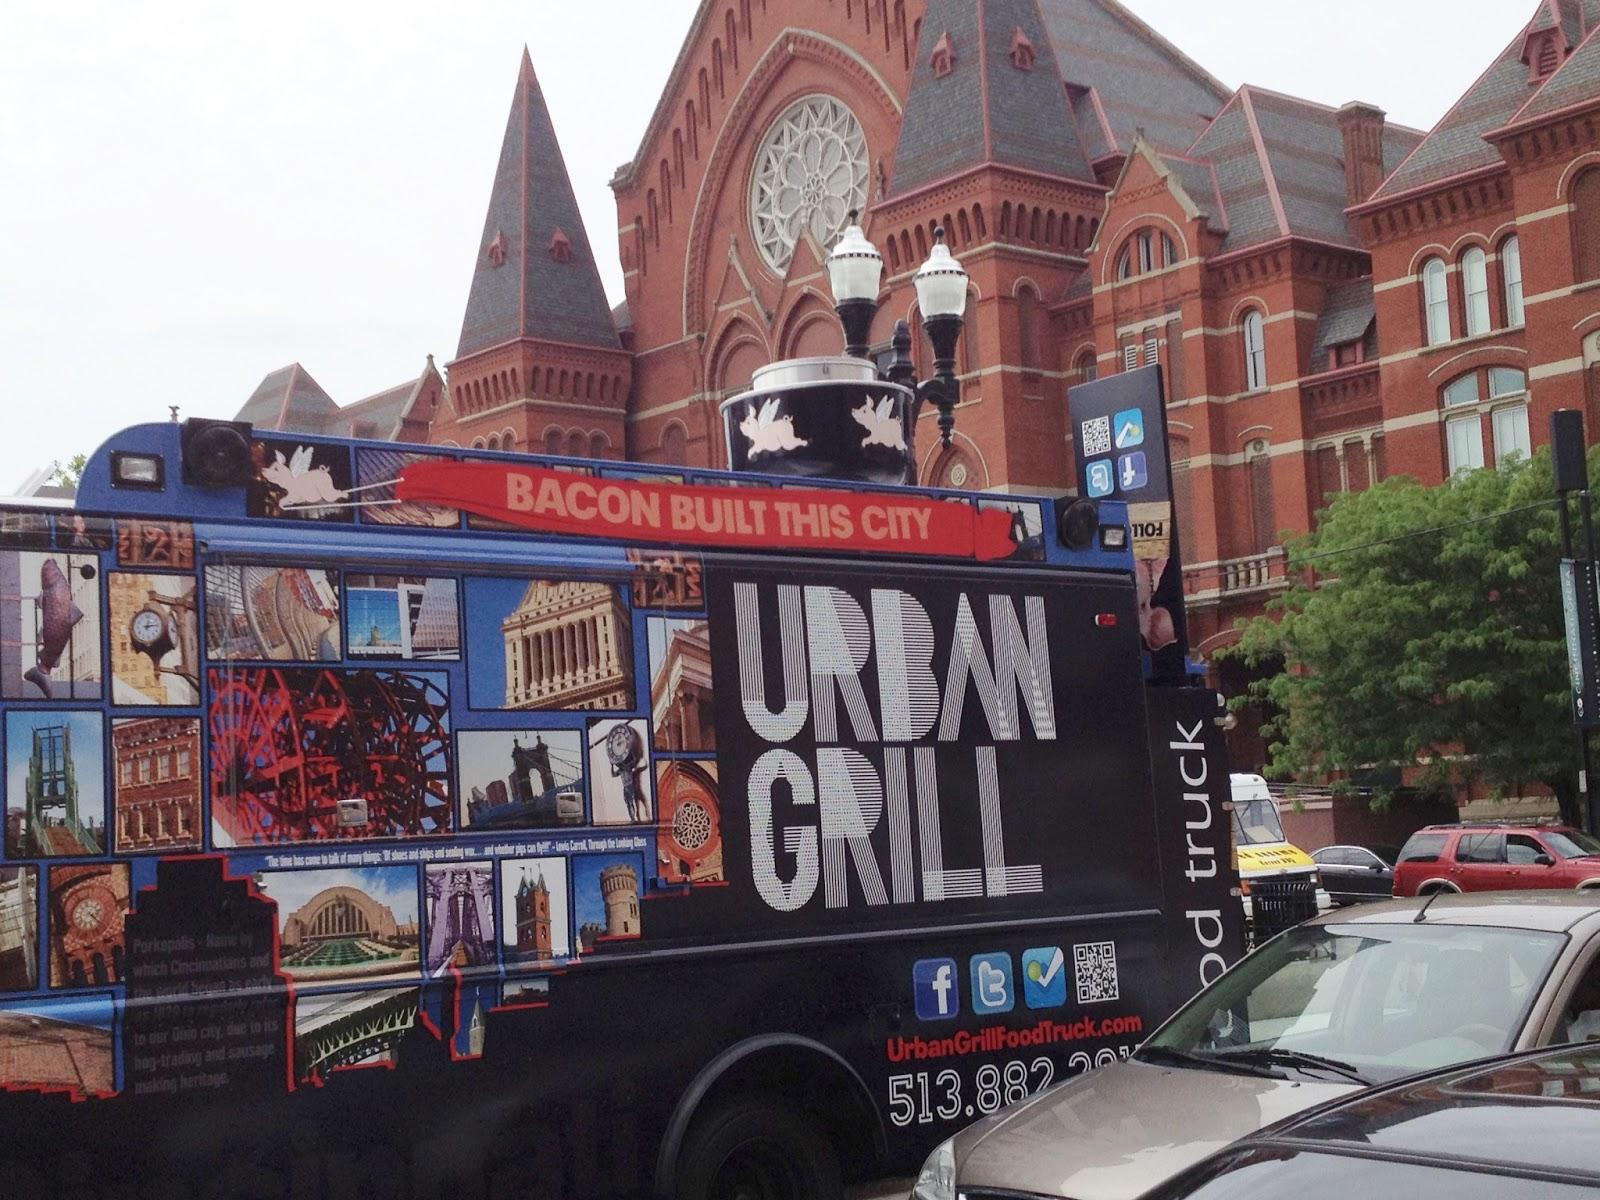 Urban Food Truck Cincinnati